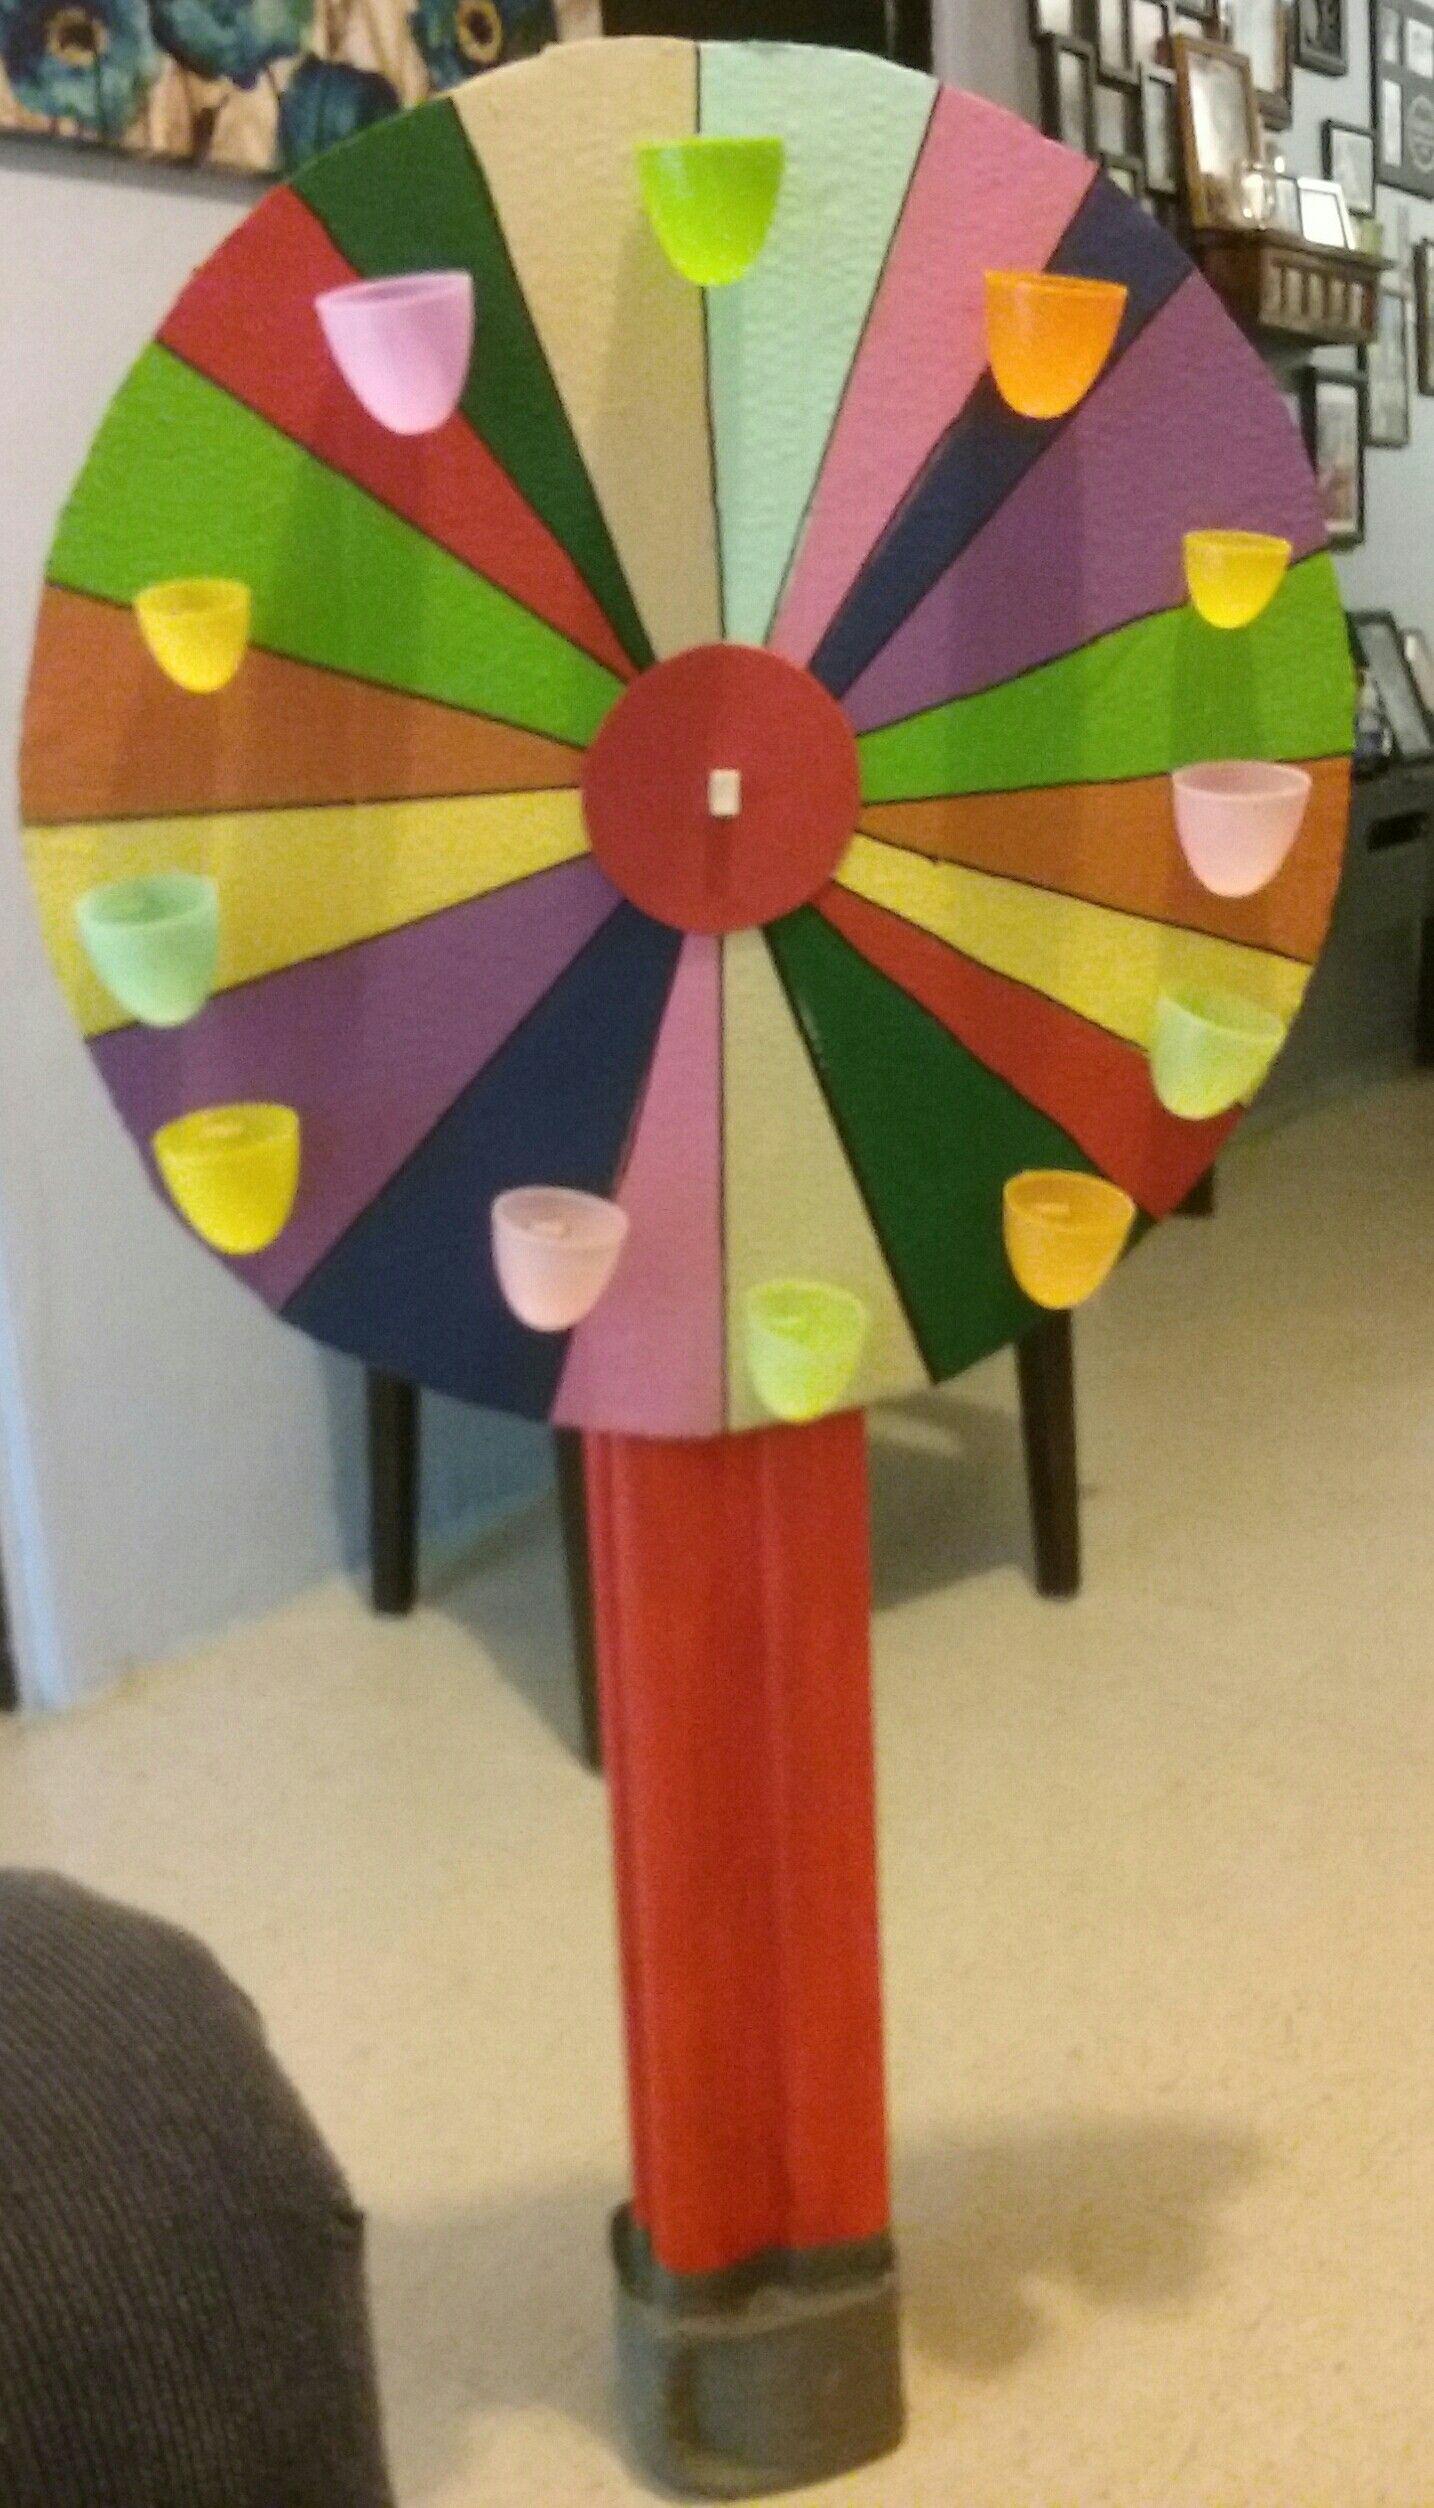 Ferris Wheel Carton Mini